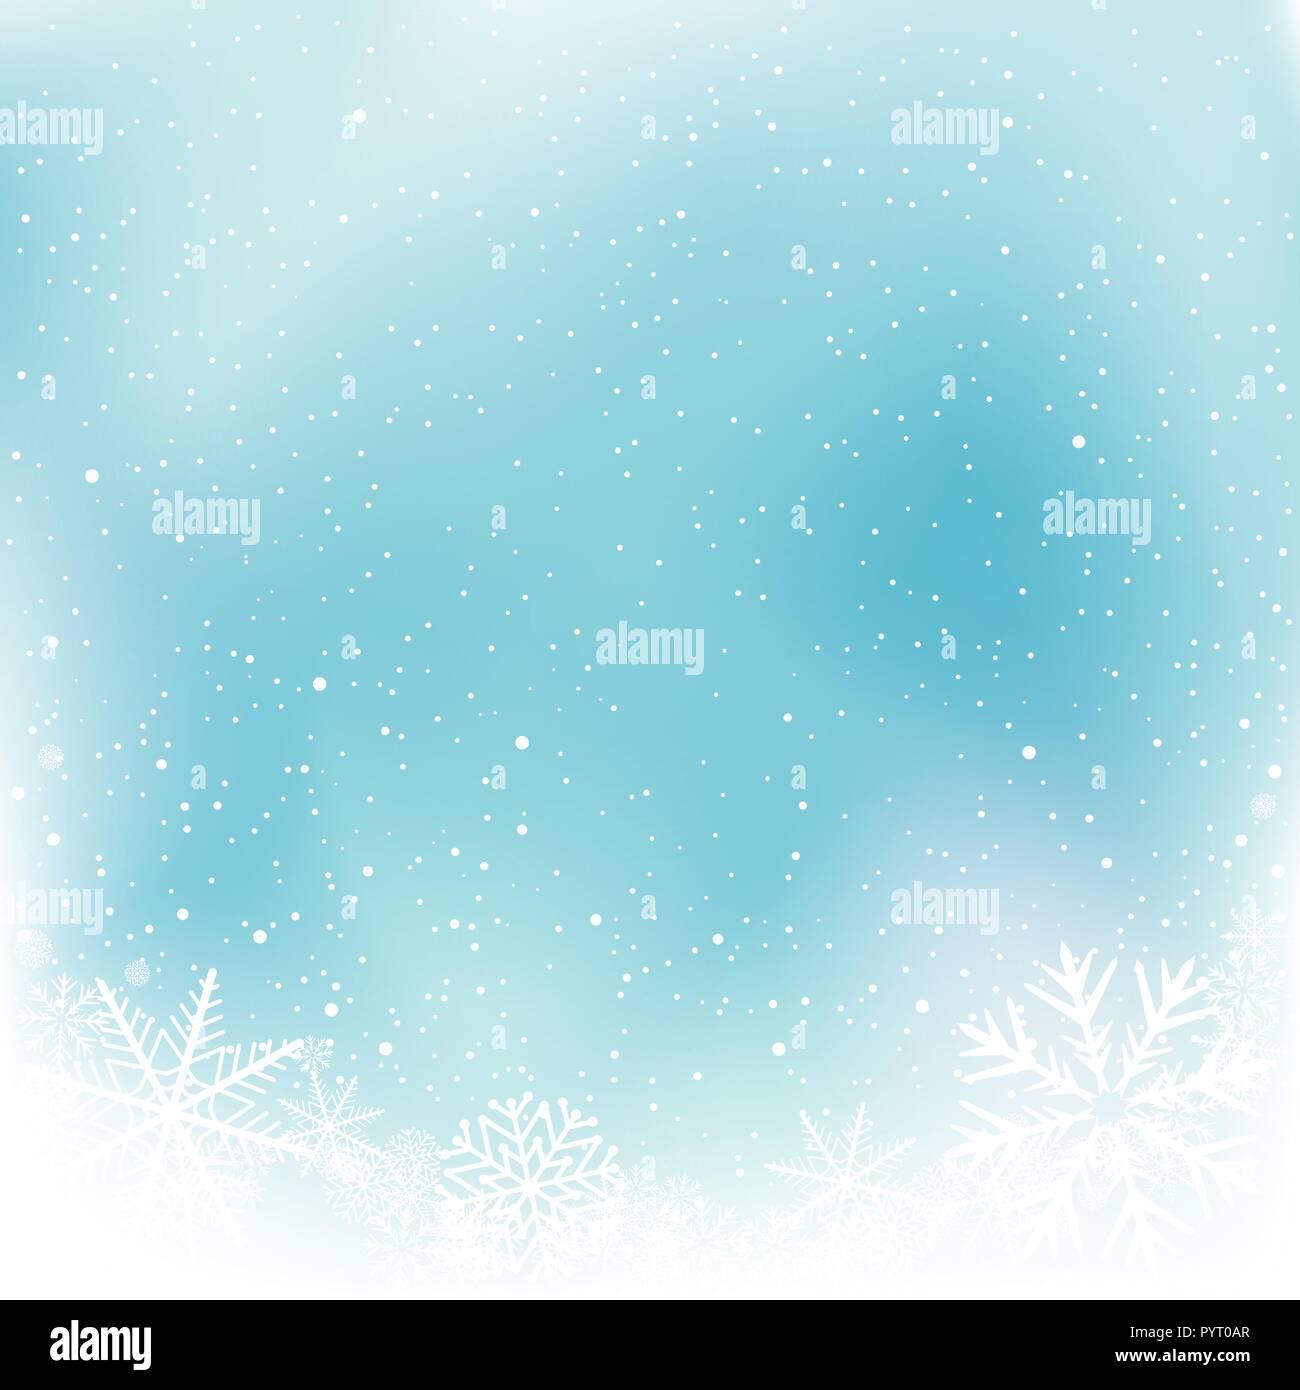 christmas blue snow winter template stock vector art illustration